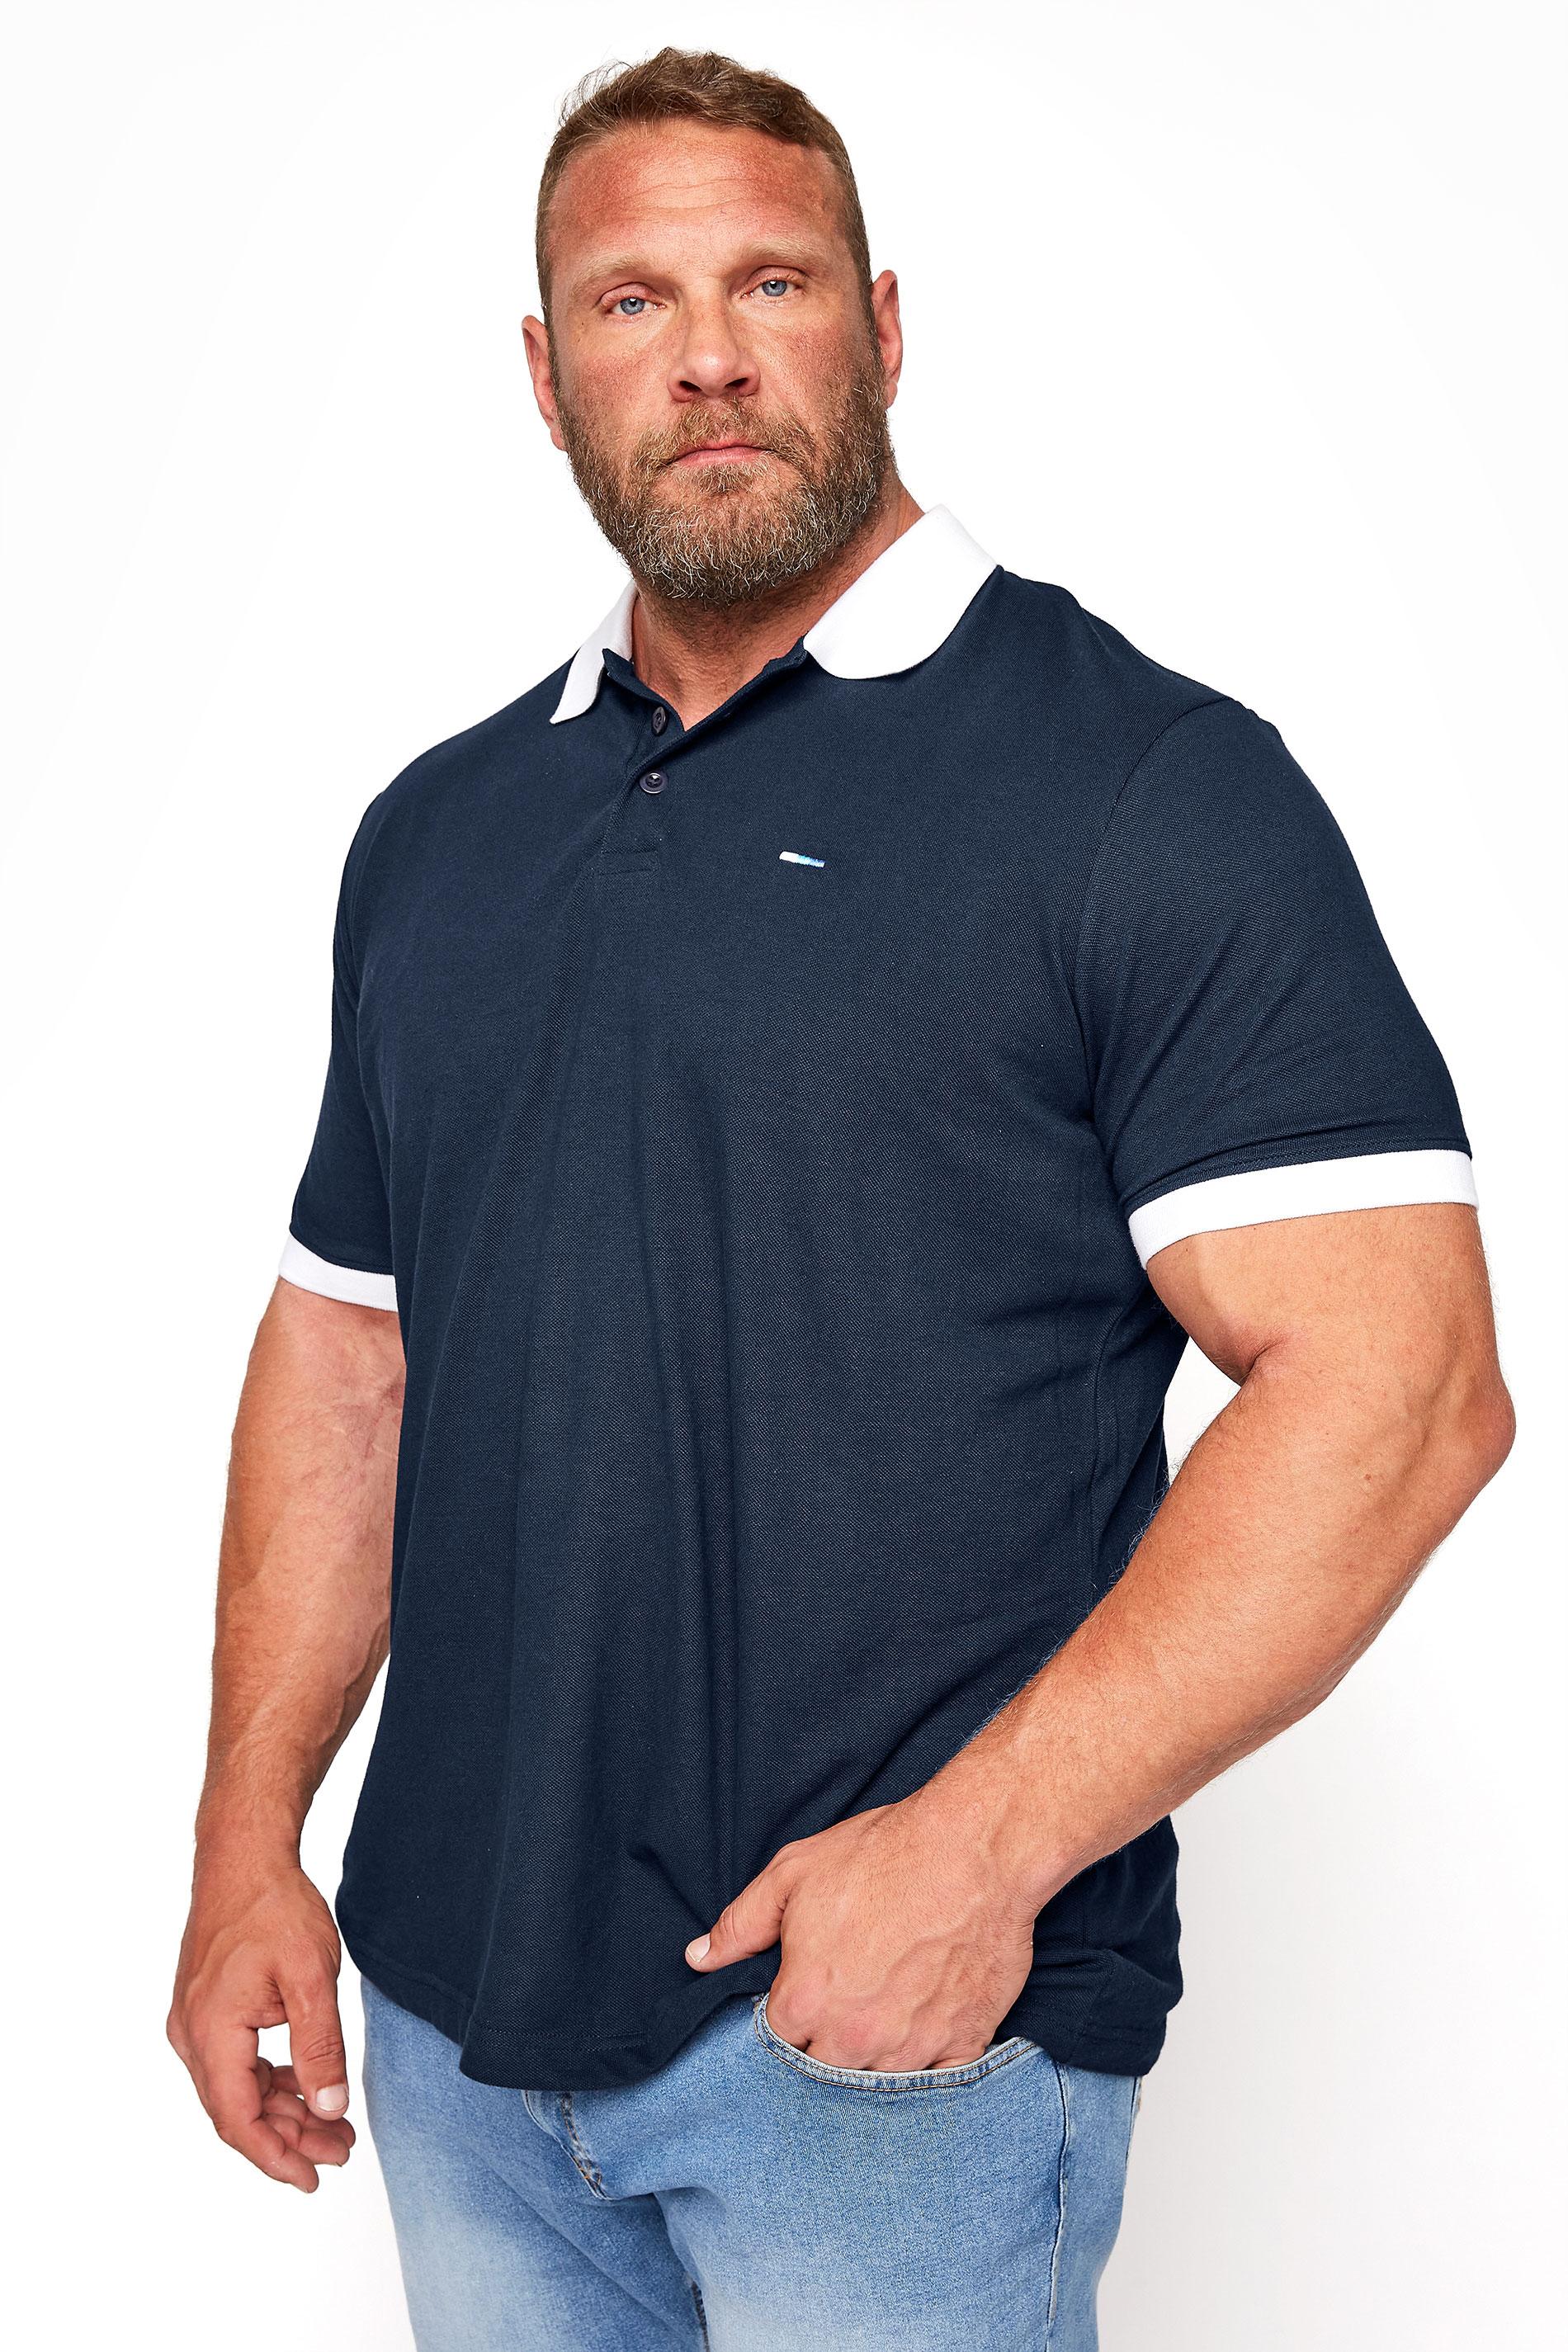 BadRhino Navy & White Contrast Polo Shirt_M.jpg